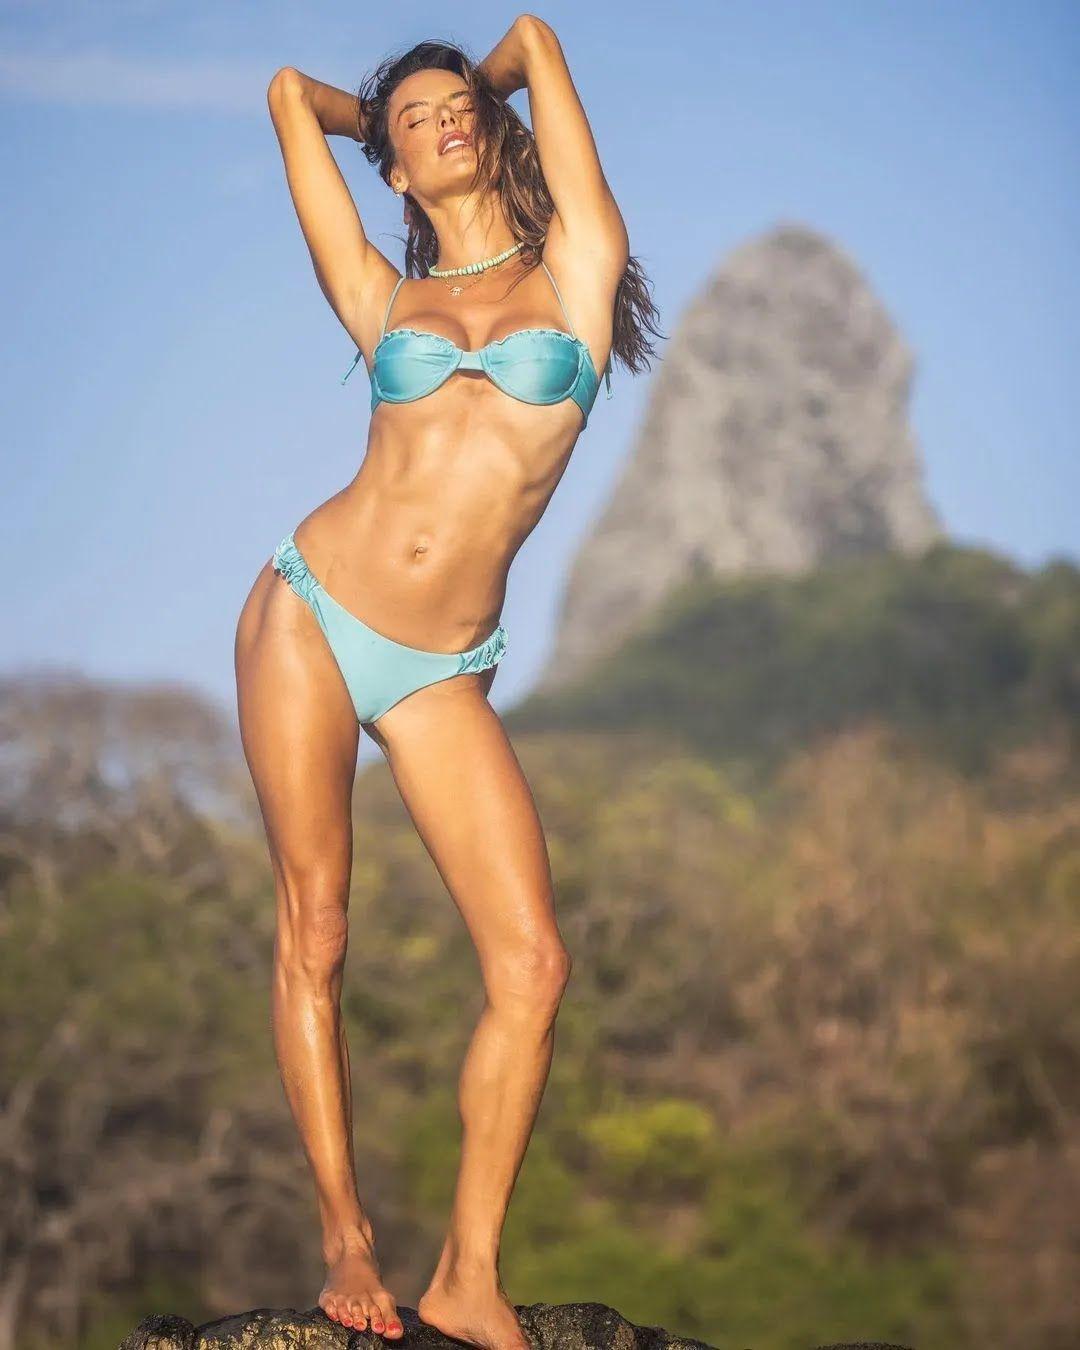 Алессандра Амбросио отдыхает на экзотическом острове